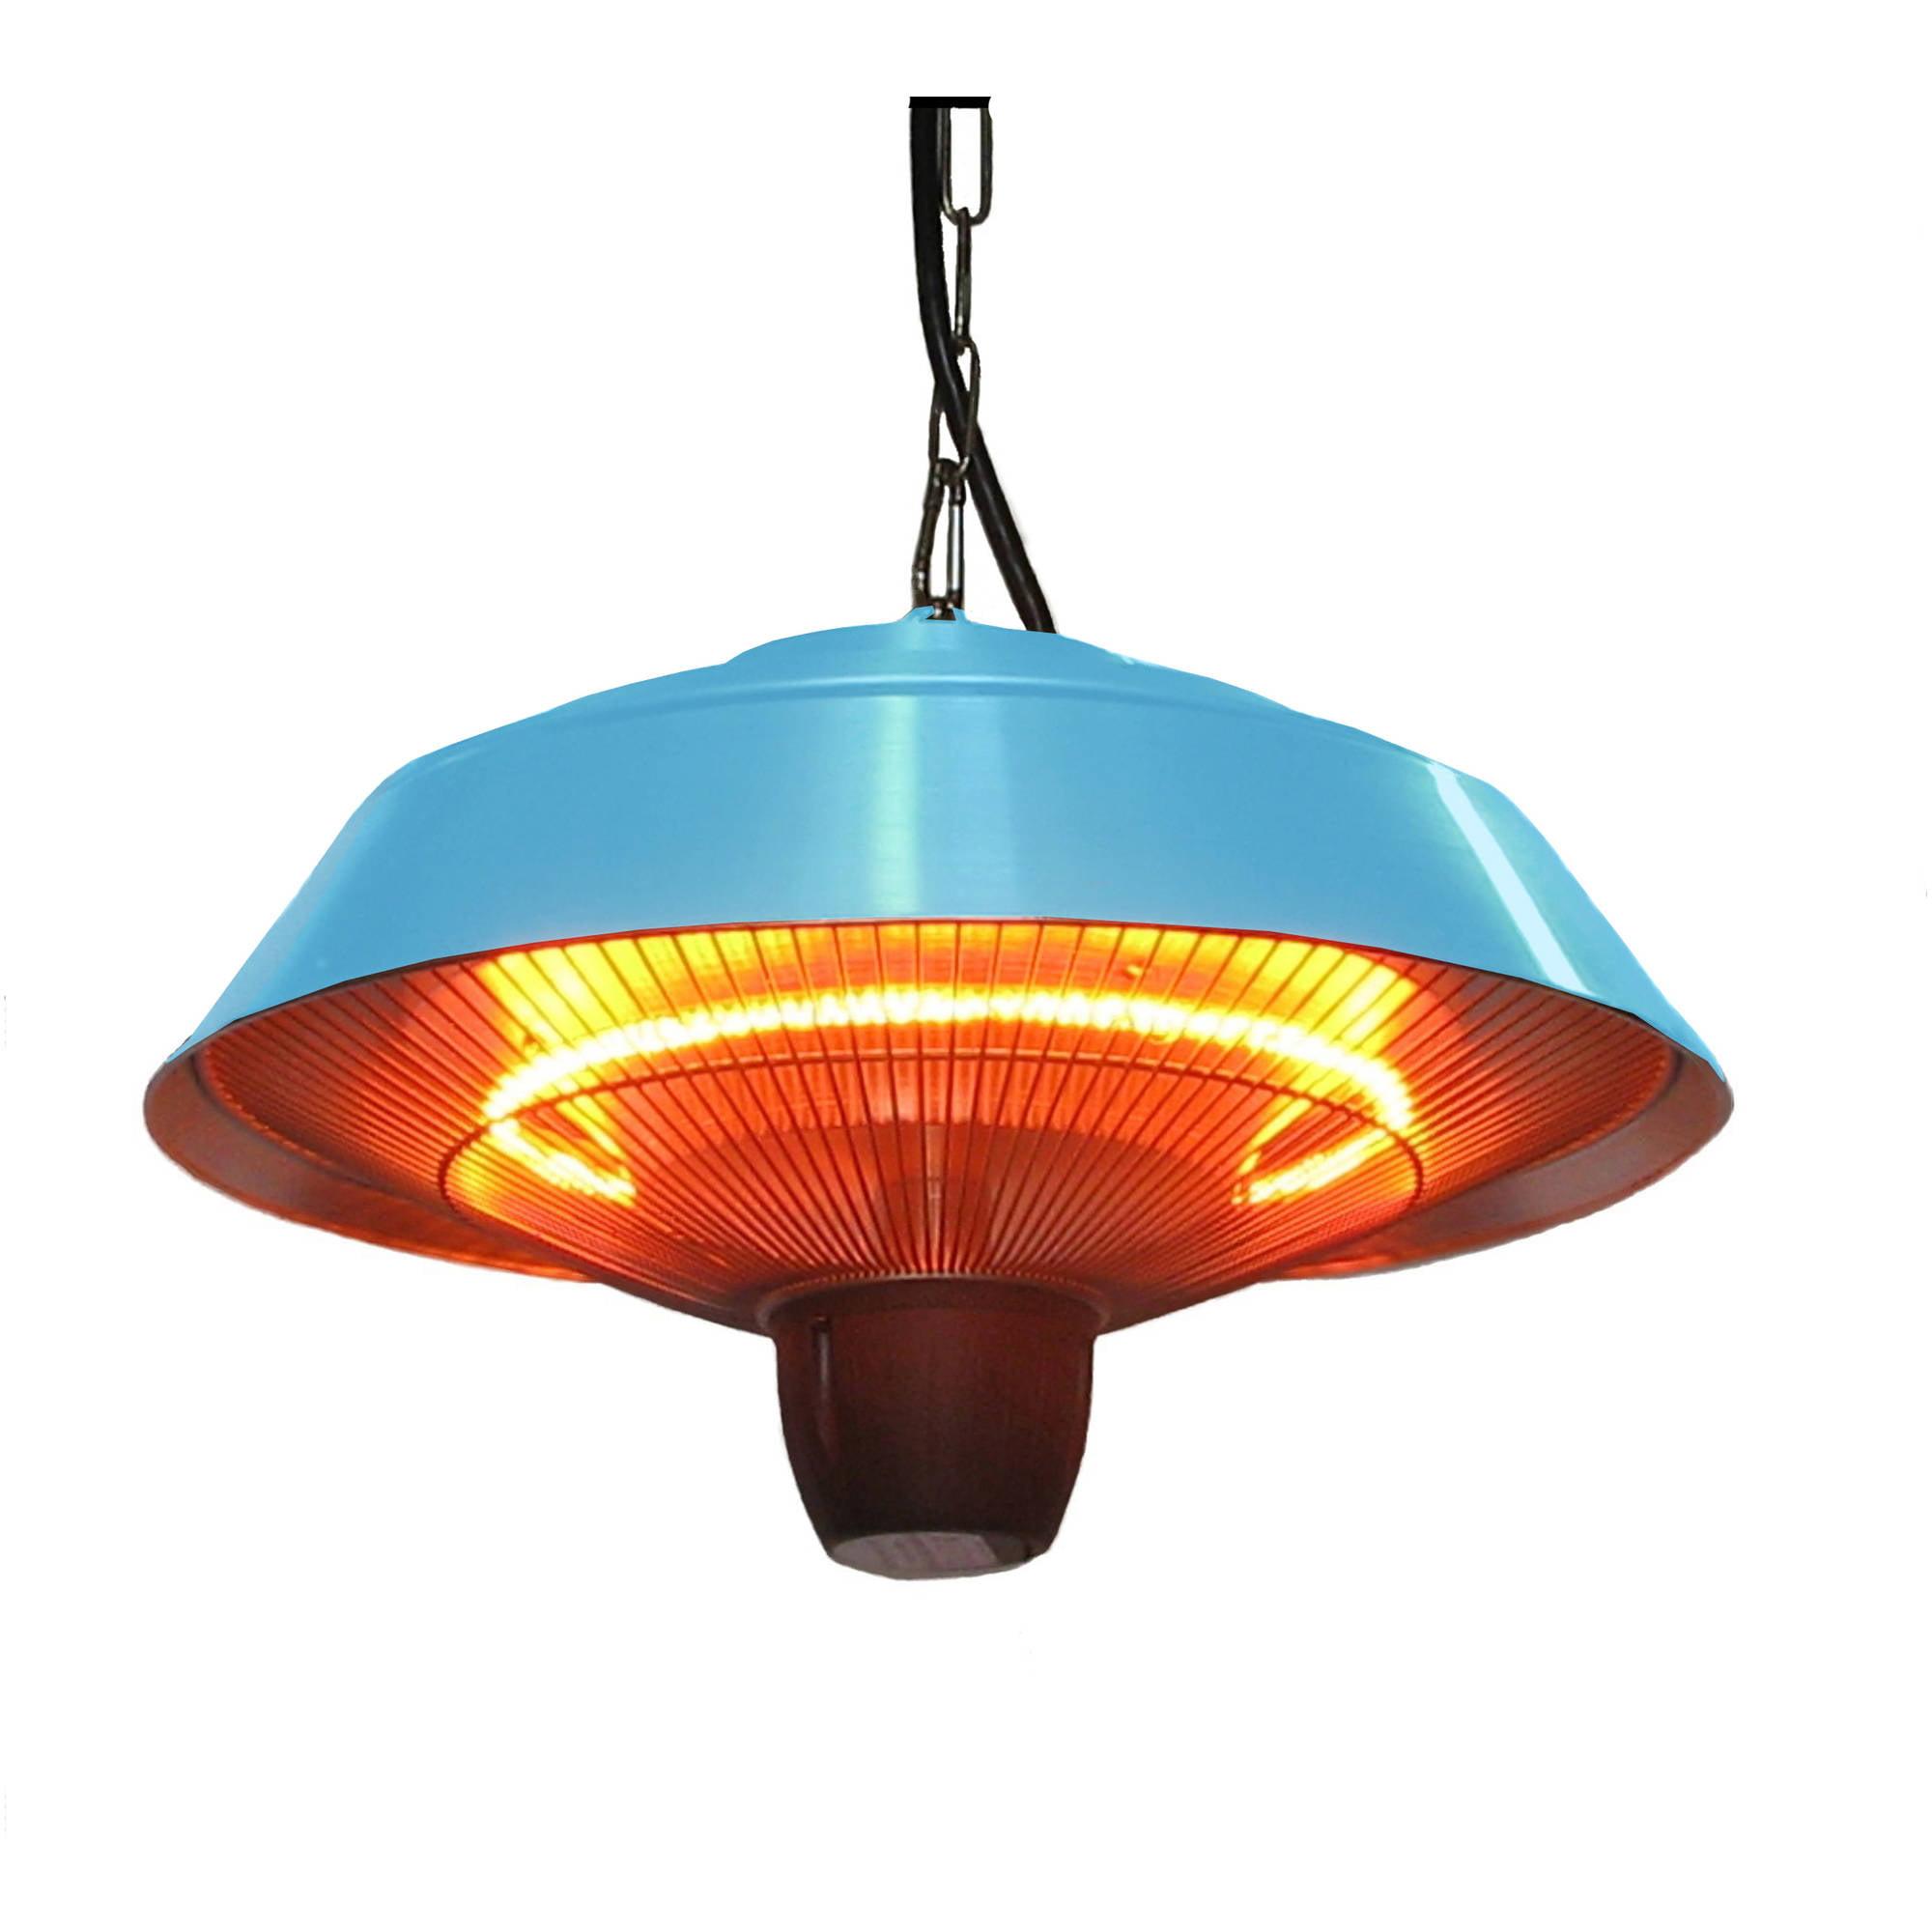 Energ Hea T Standing Outdoor Electric Infrared Heater